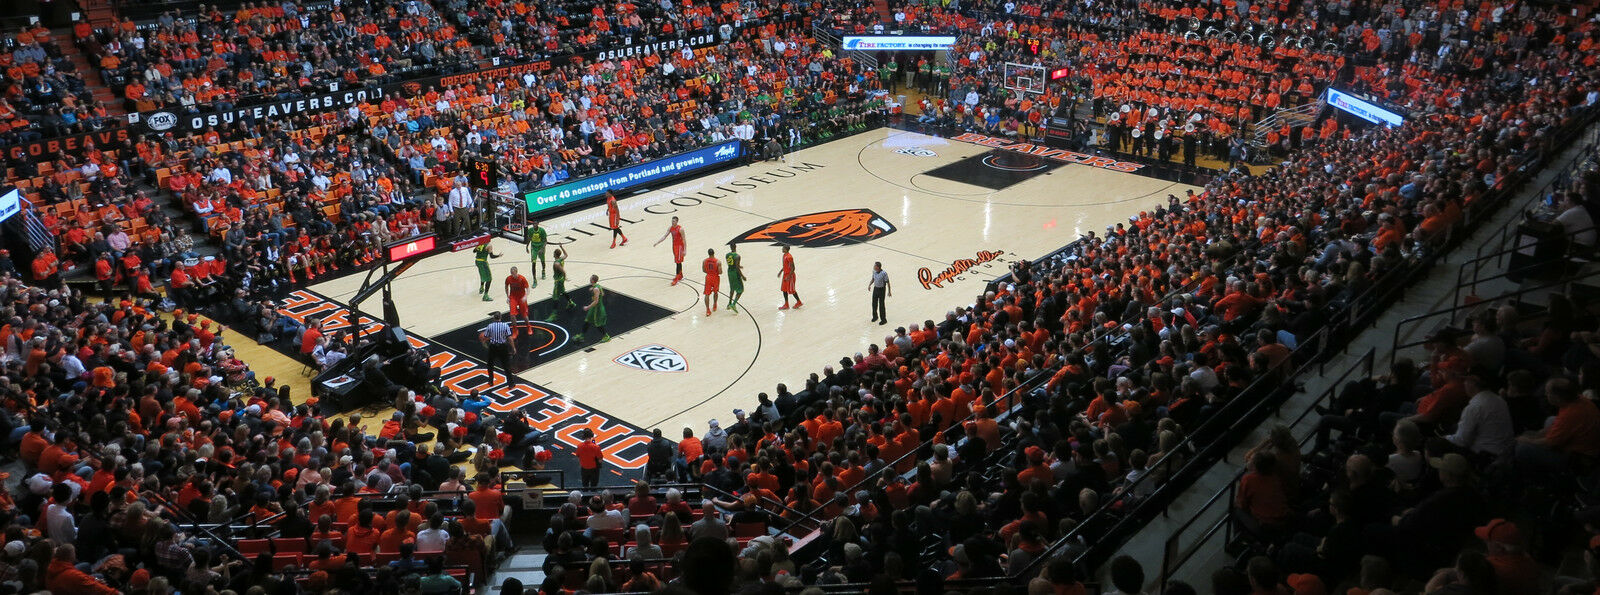 Washington State Cougars at Oregon State Beavers Basketball